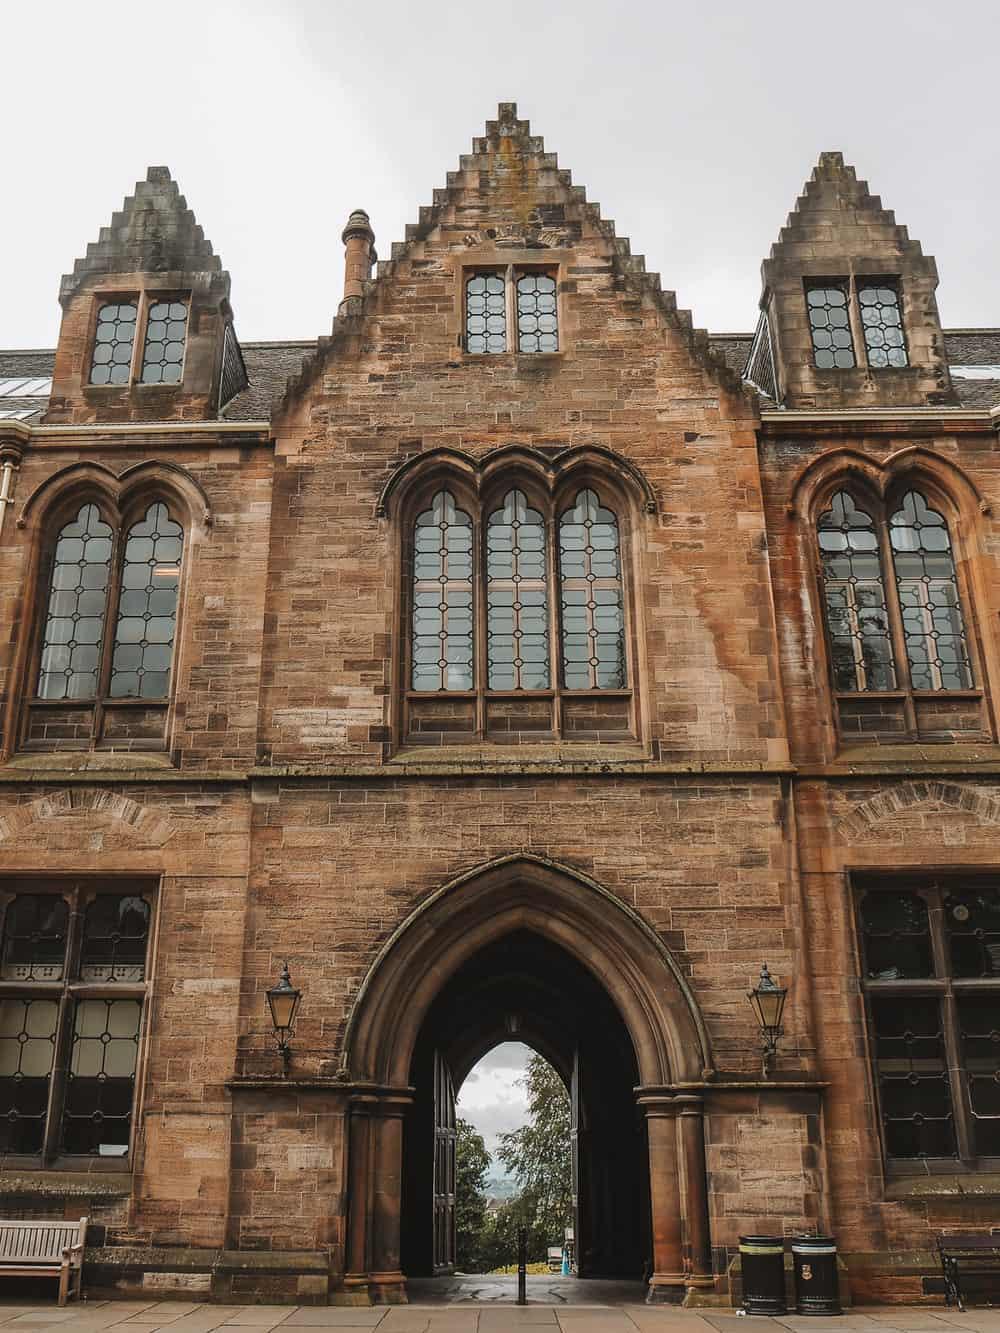 University of Glasgow Outlander locations